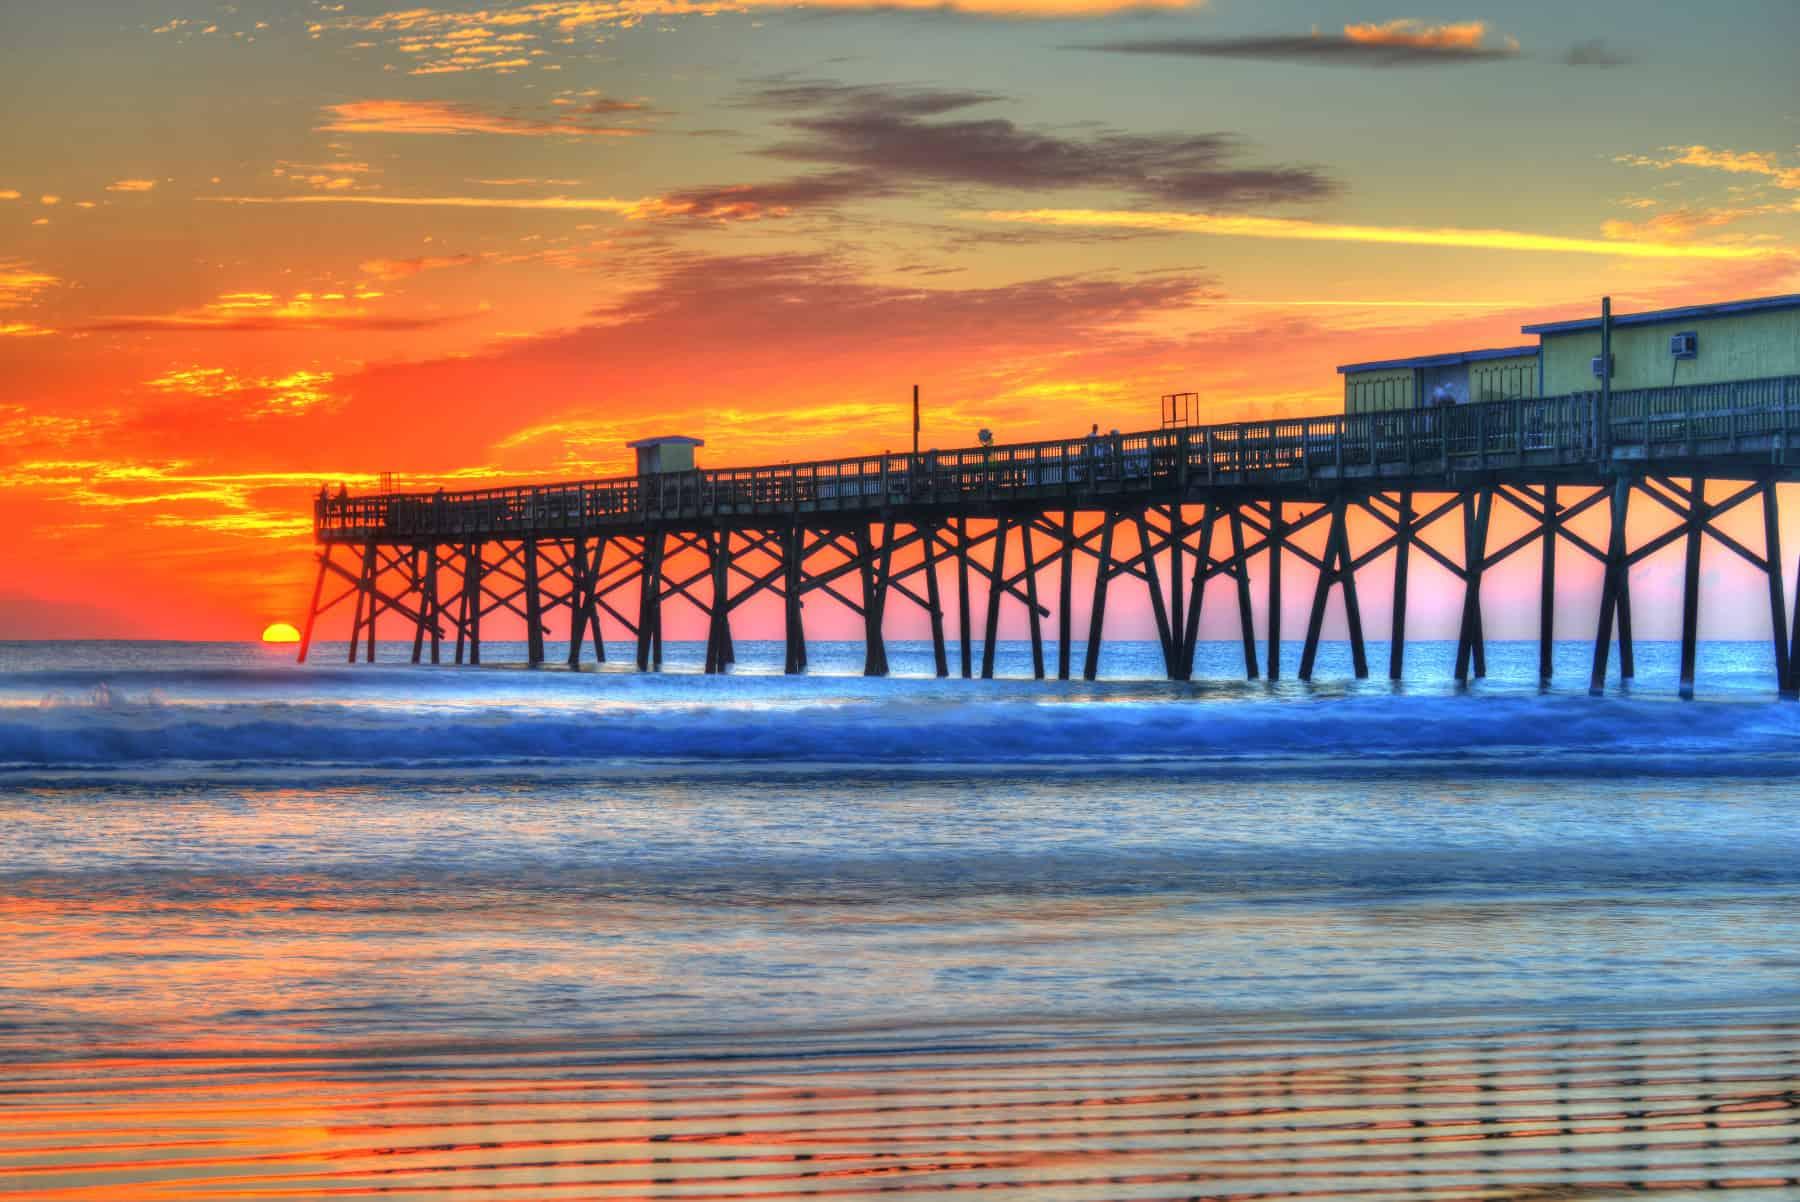 Daytona Beach - Sunglow Pier